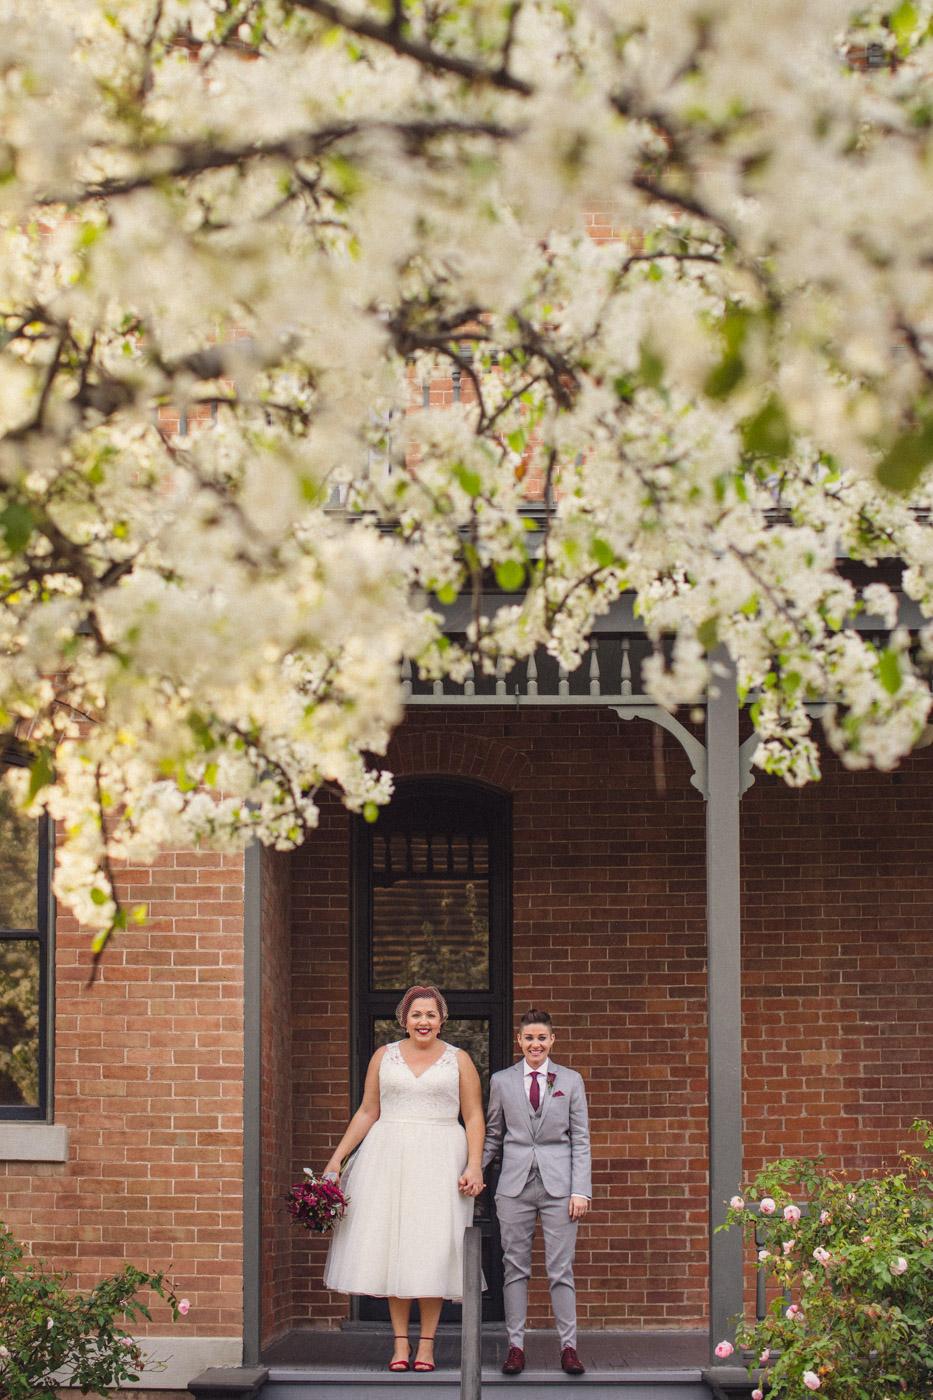 heritage-square-wedding-portrait-cherry-blossoms